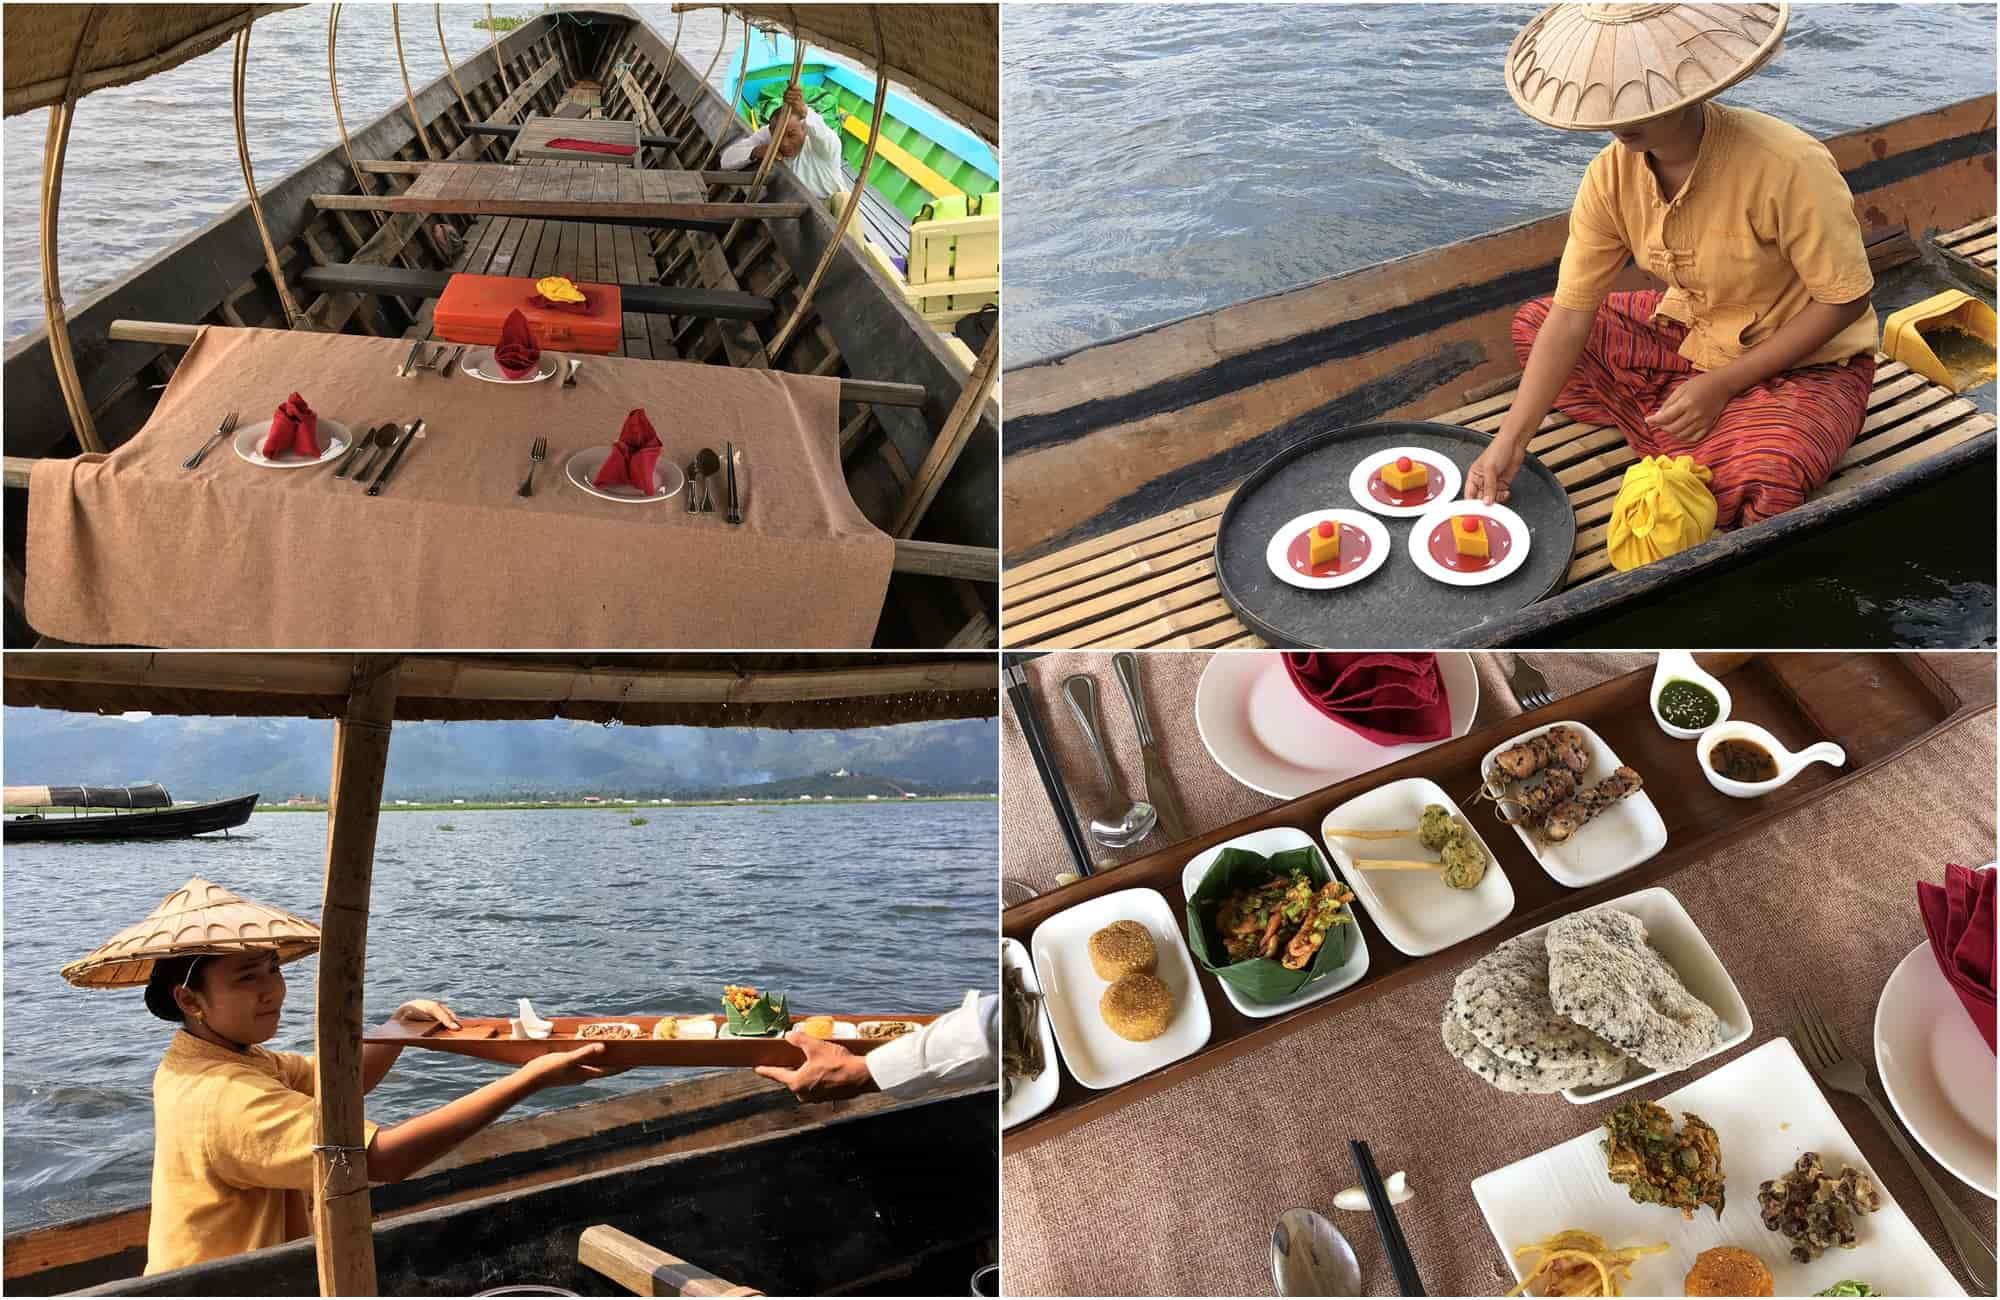 Voyage Birmanie - Déjeuner pirogue lac Inle - Amplitudes